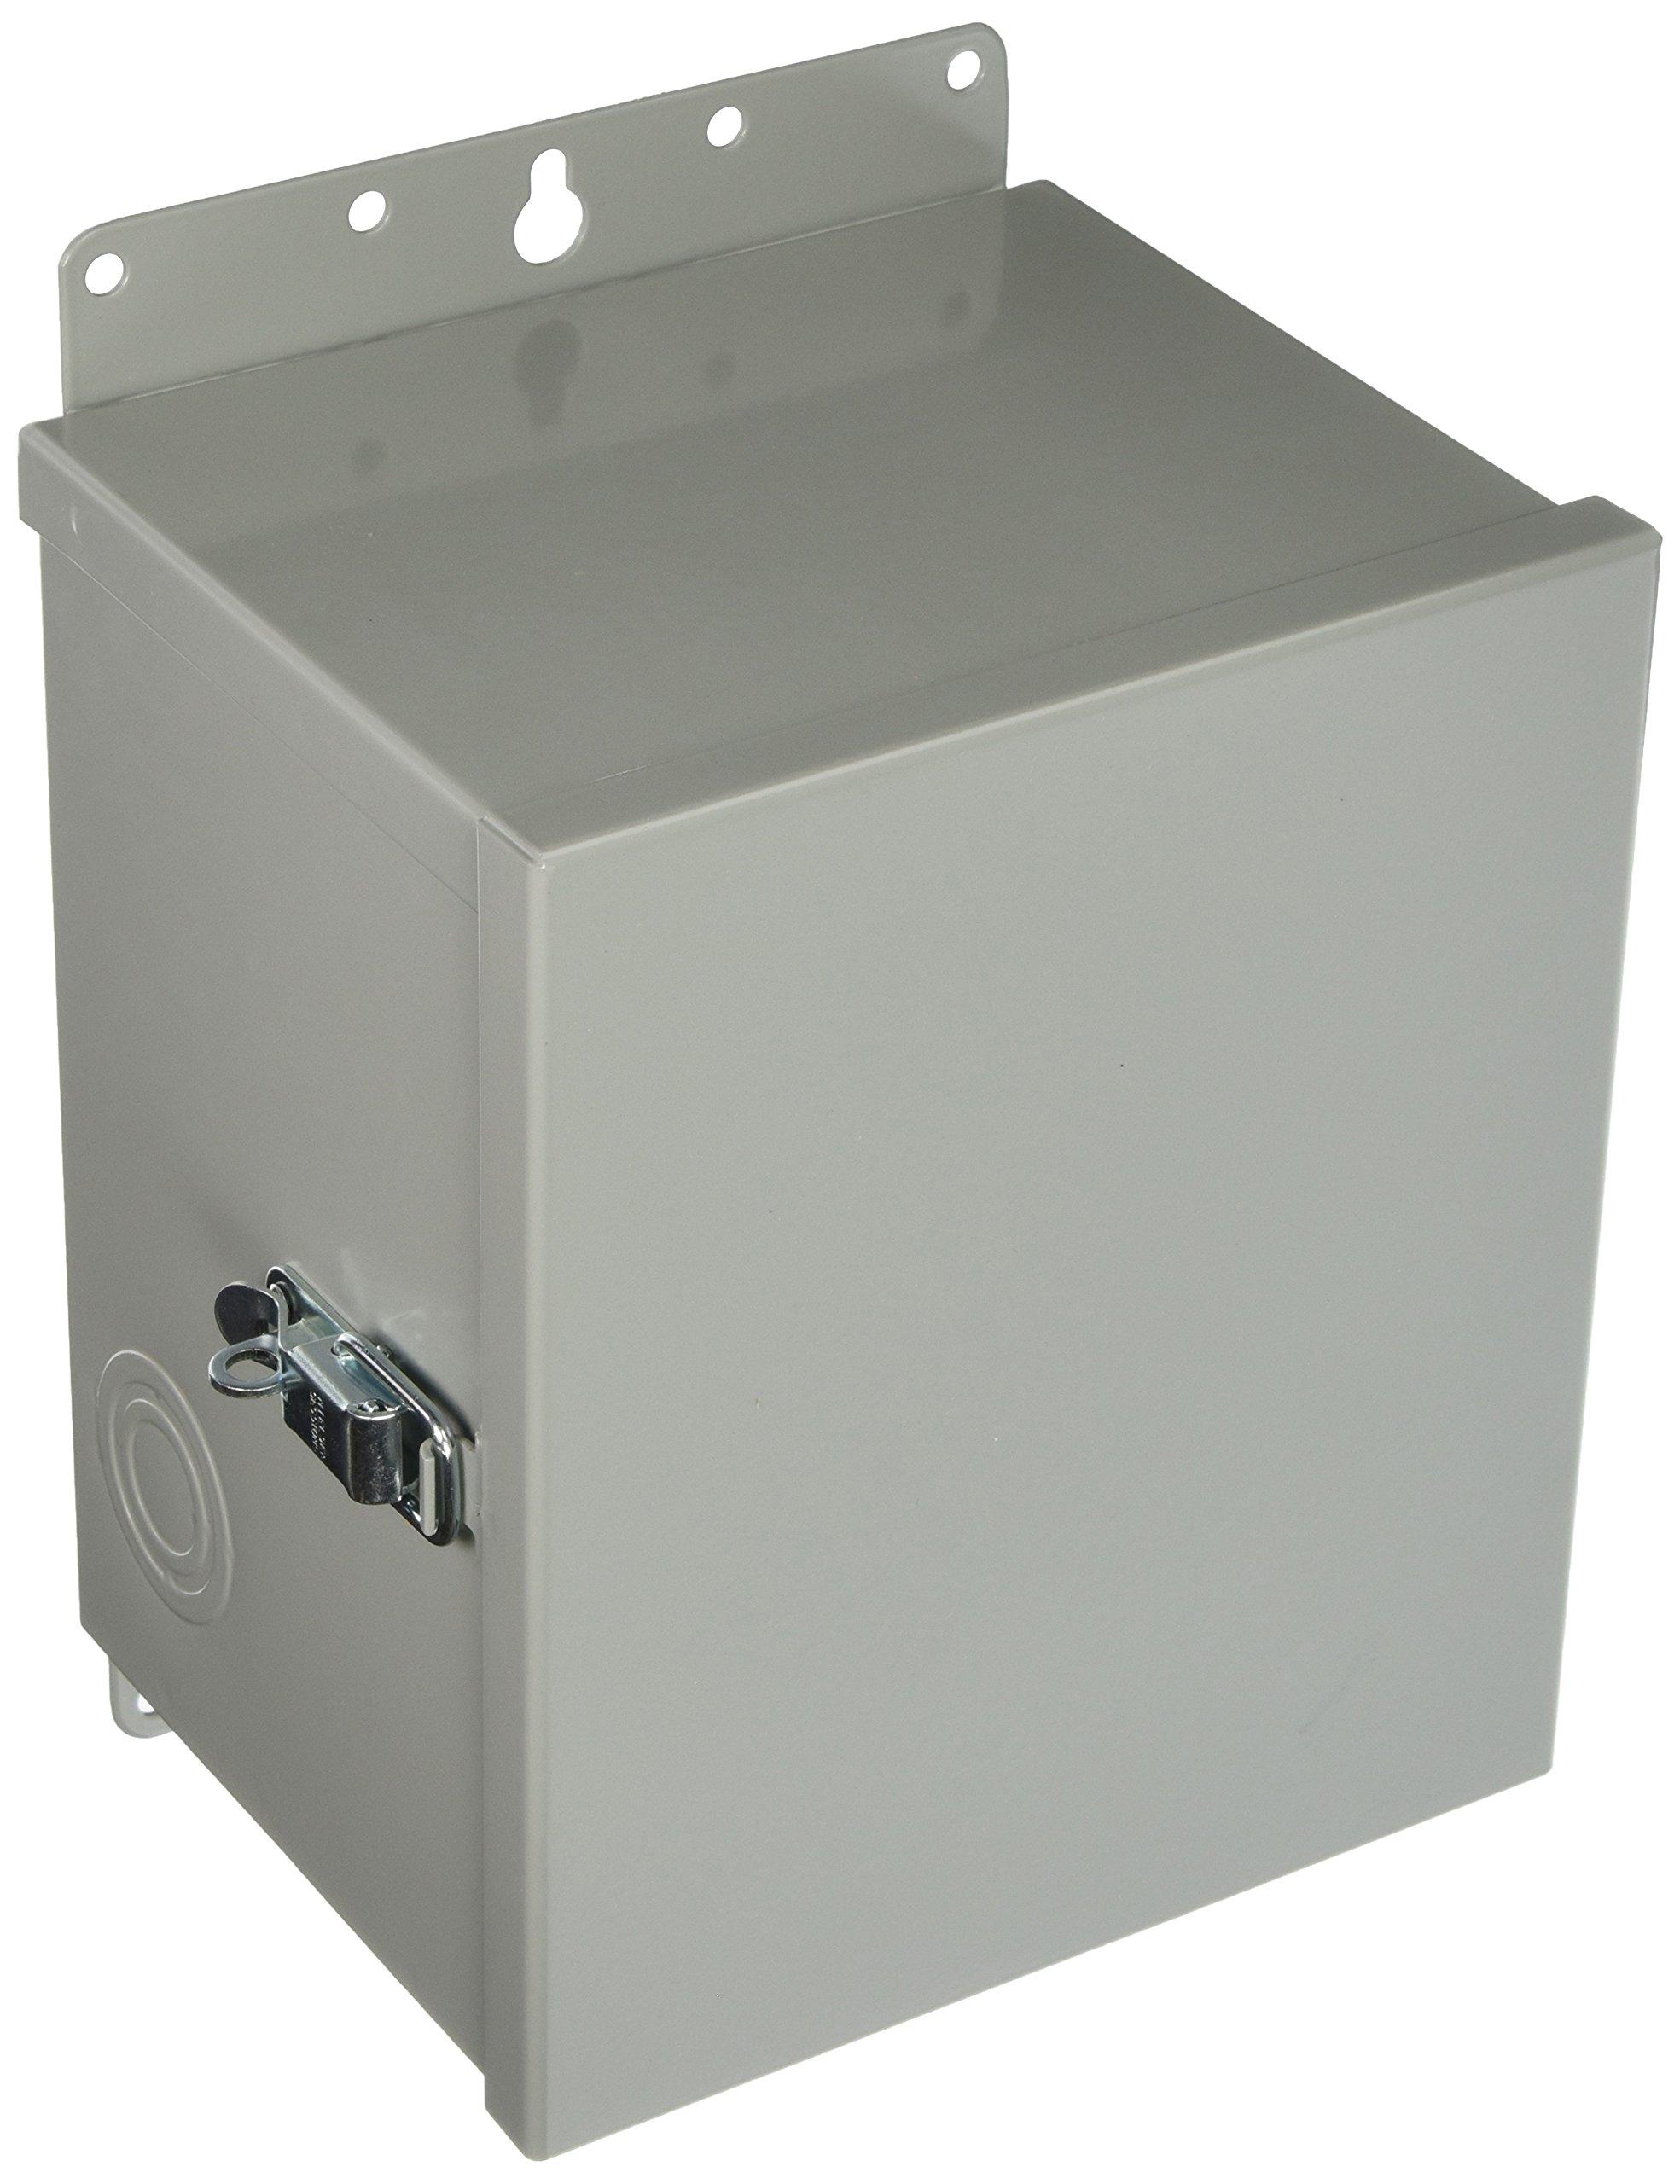 Reliance Controls Corporation CSR201 Easy/Tran Transfer Switch for Up to 2,500 Running Watt Generators